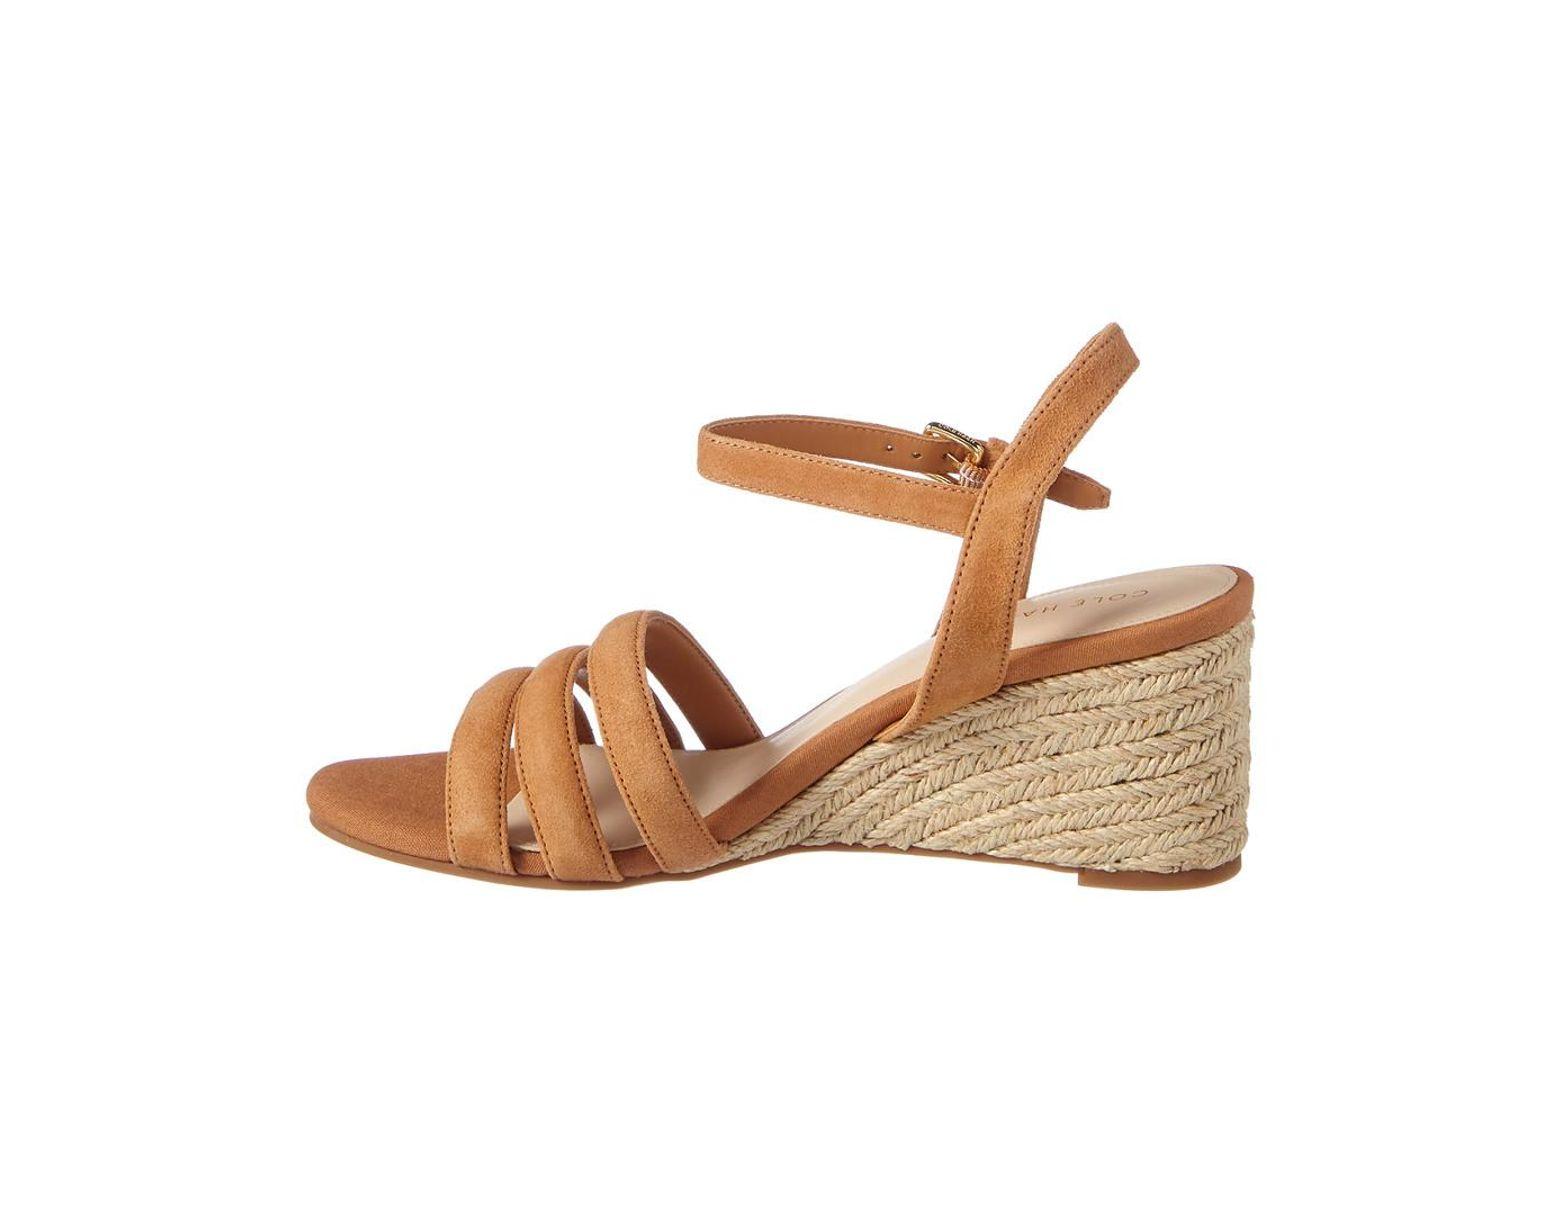 55bf384496b Cole Haan Jasmine Espadrille Leather Wedge Sandal in Brown - Lyst